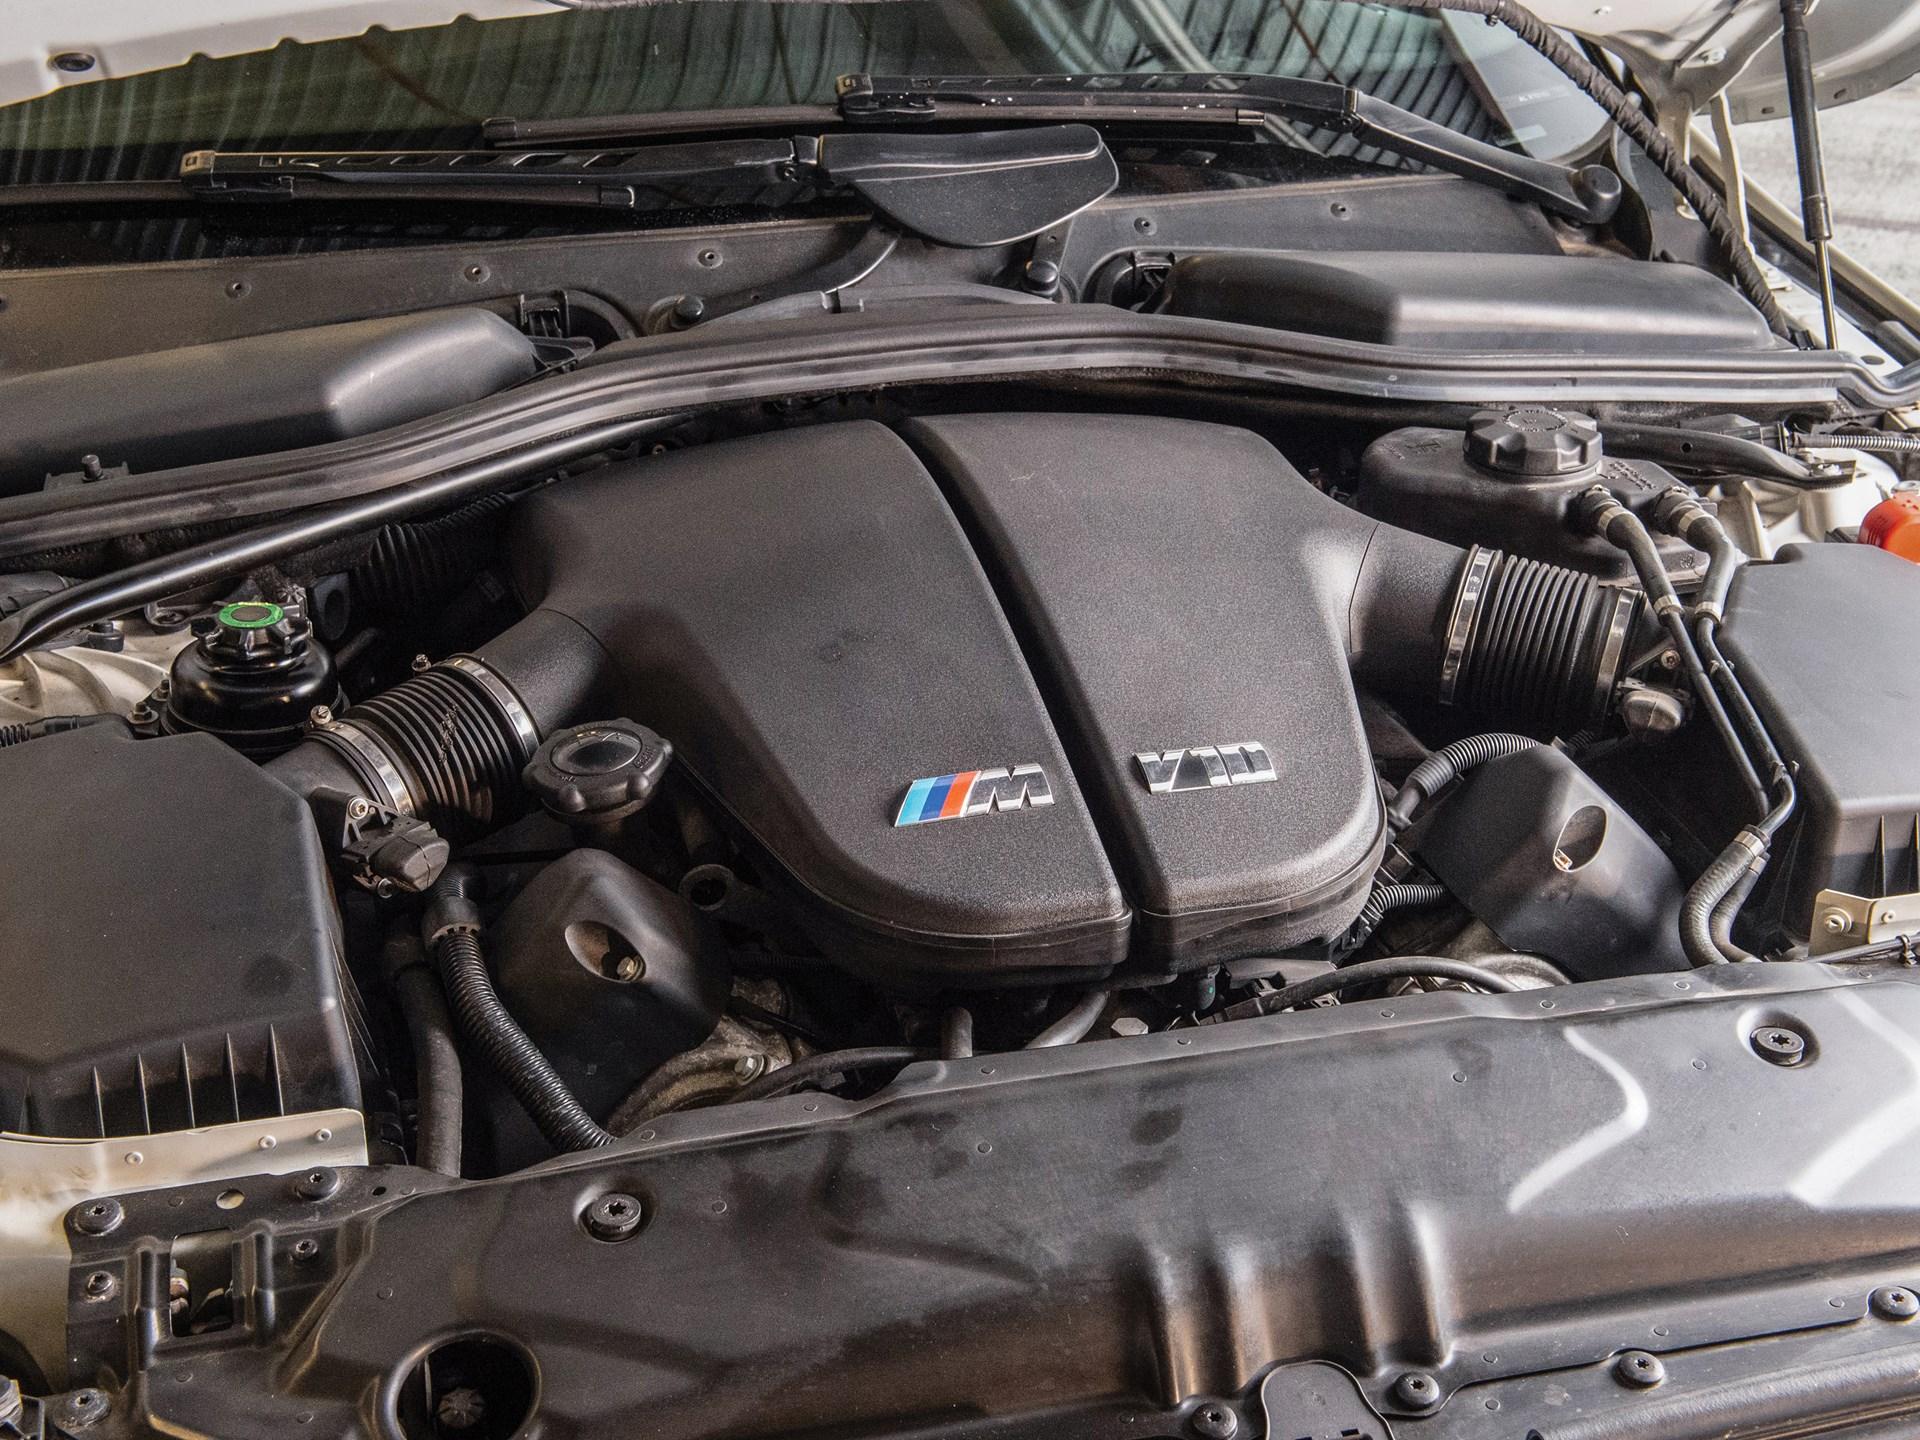 2008 BMW M5 v10 engine